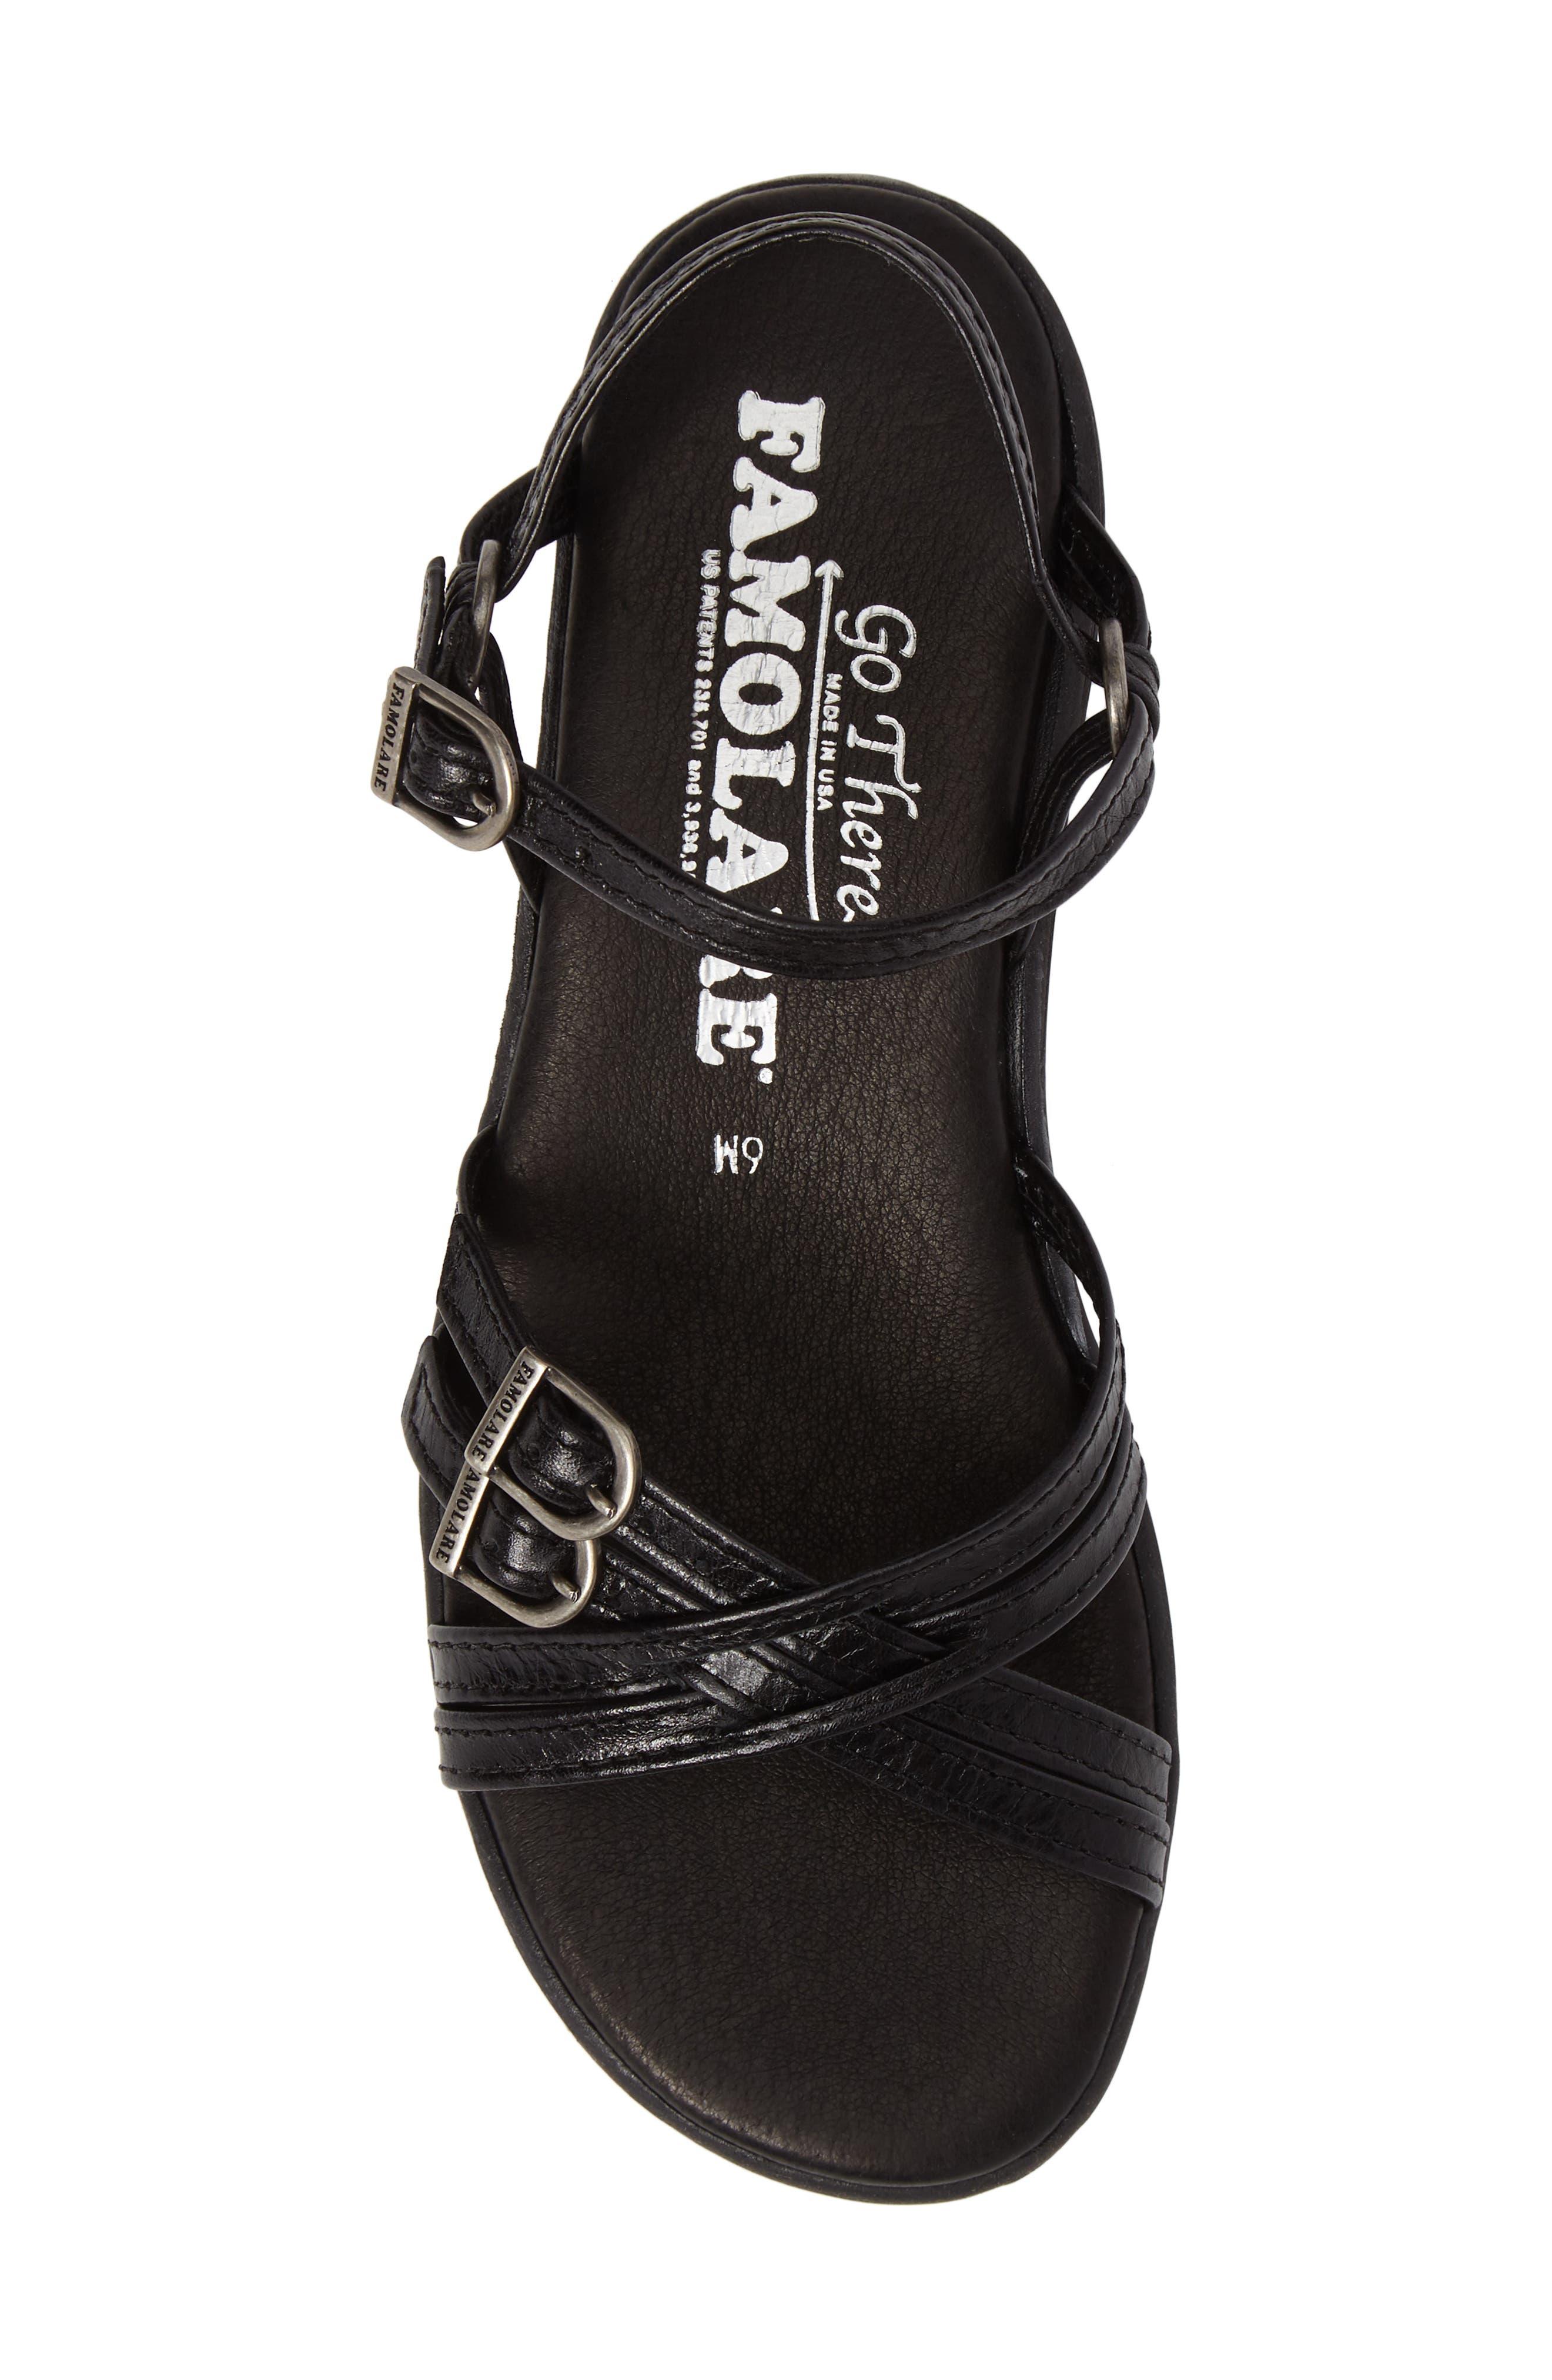 Strapsody Buckle Sandal,                             Alternate thumbnail 4, color,                             Coal Leather